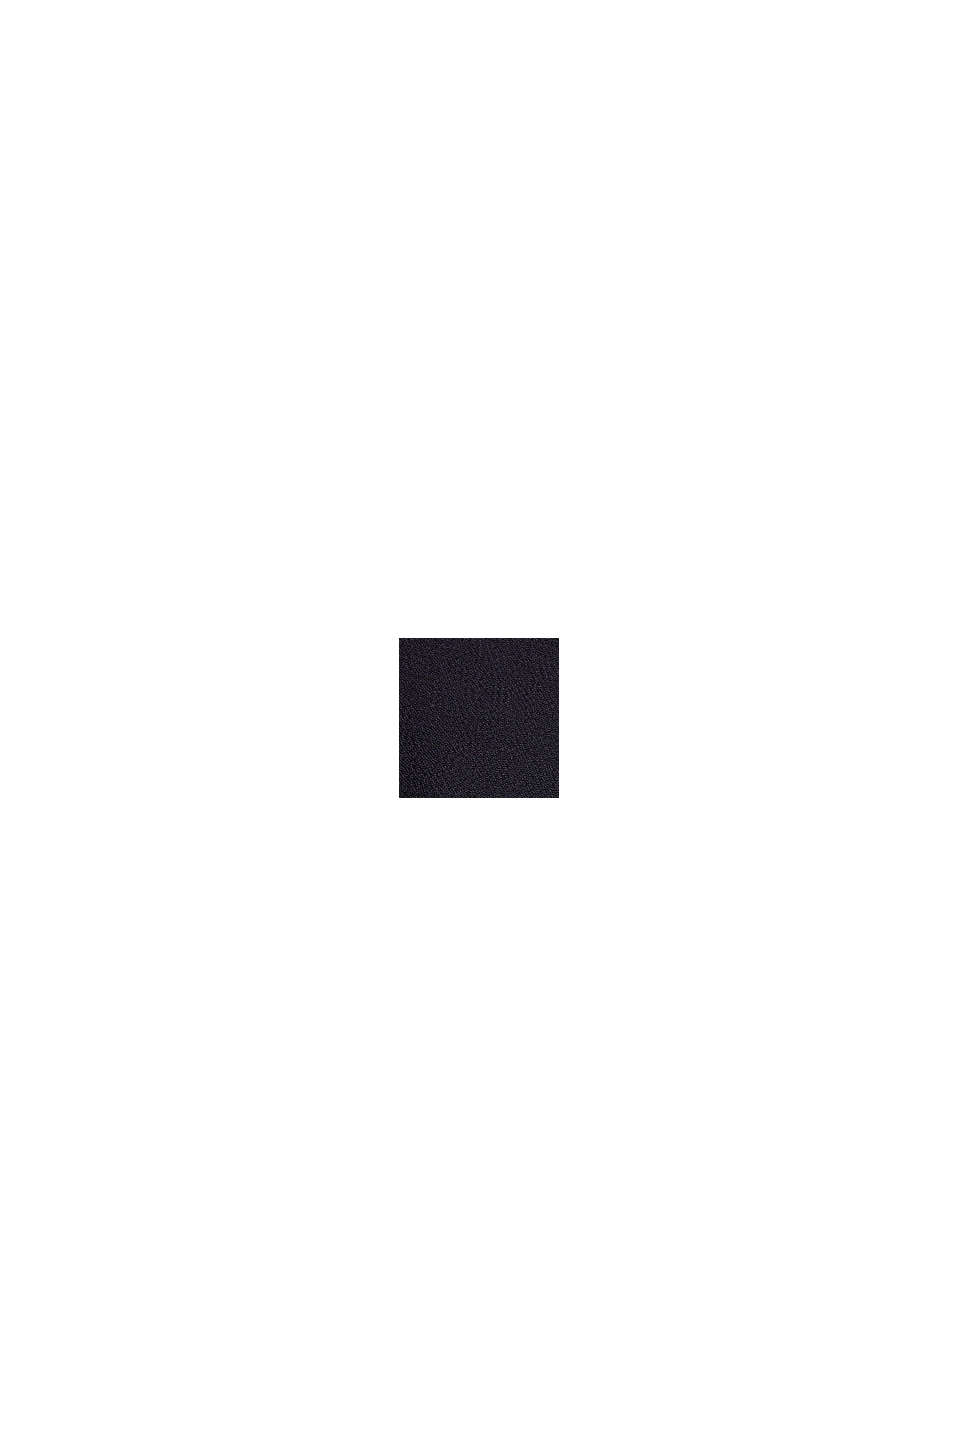 Blusentop mit Schleife, LENZING™ ECOVERO™, BLACK, swatch